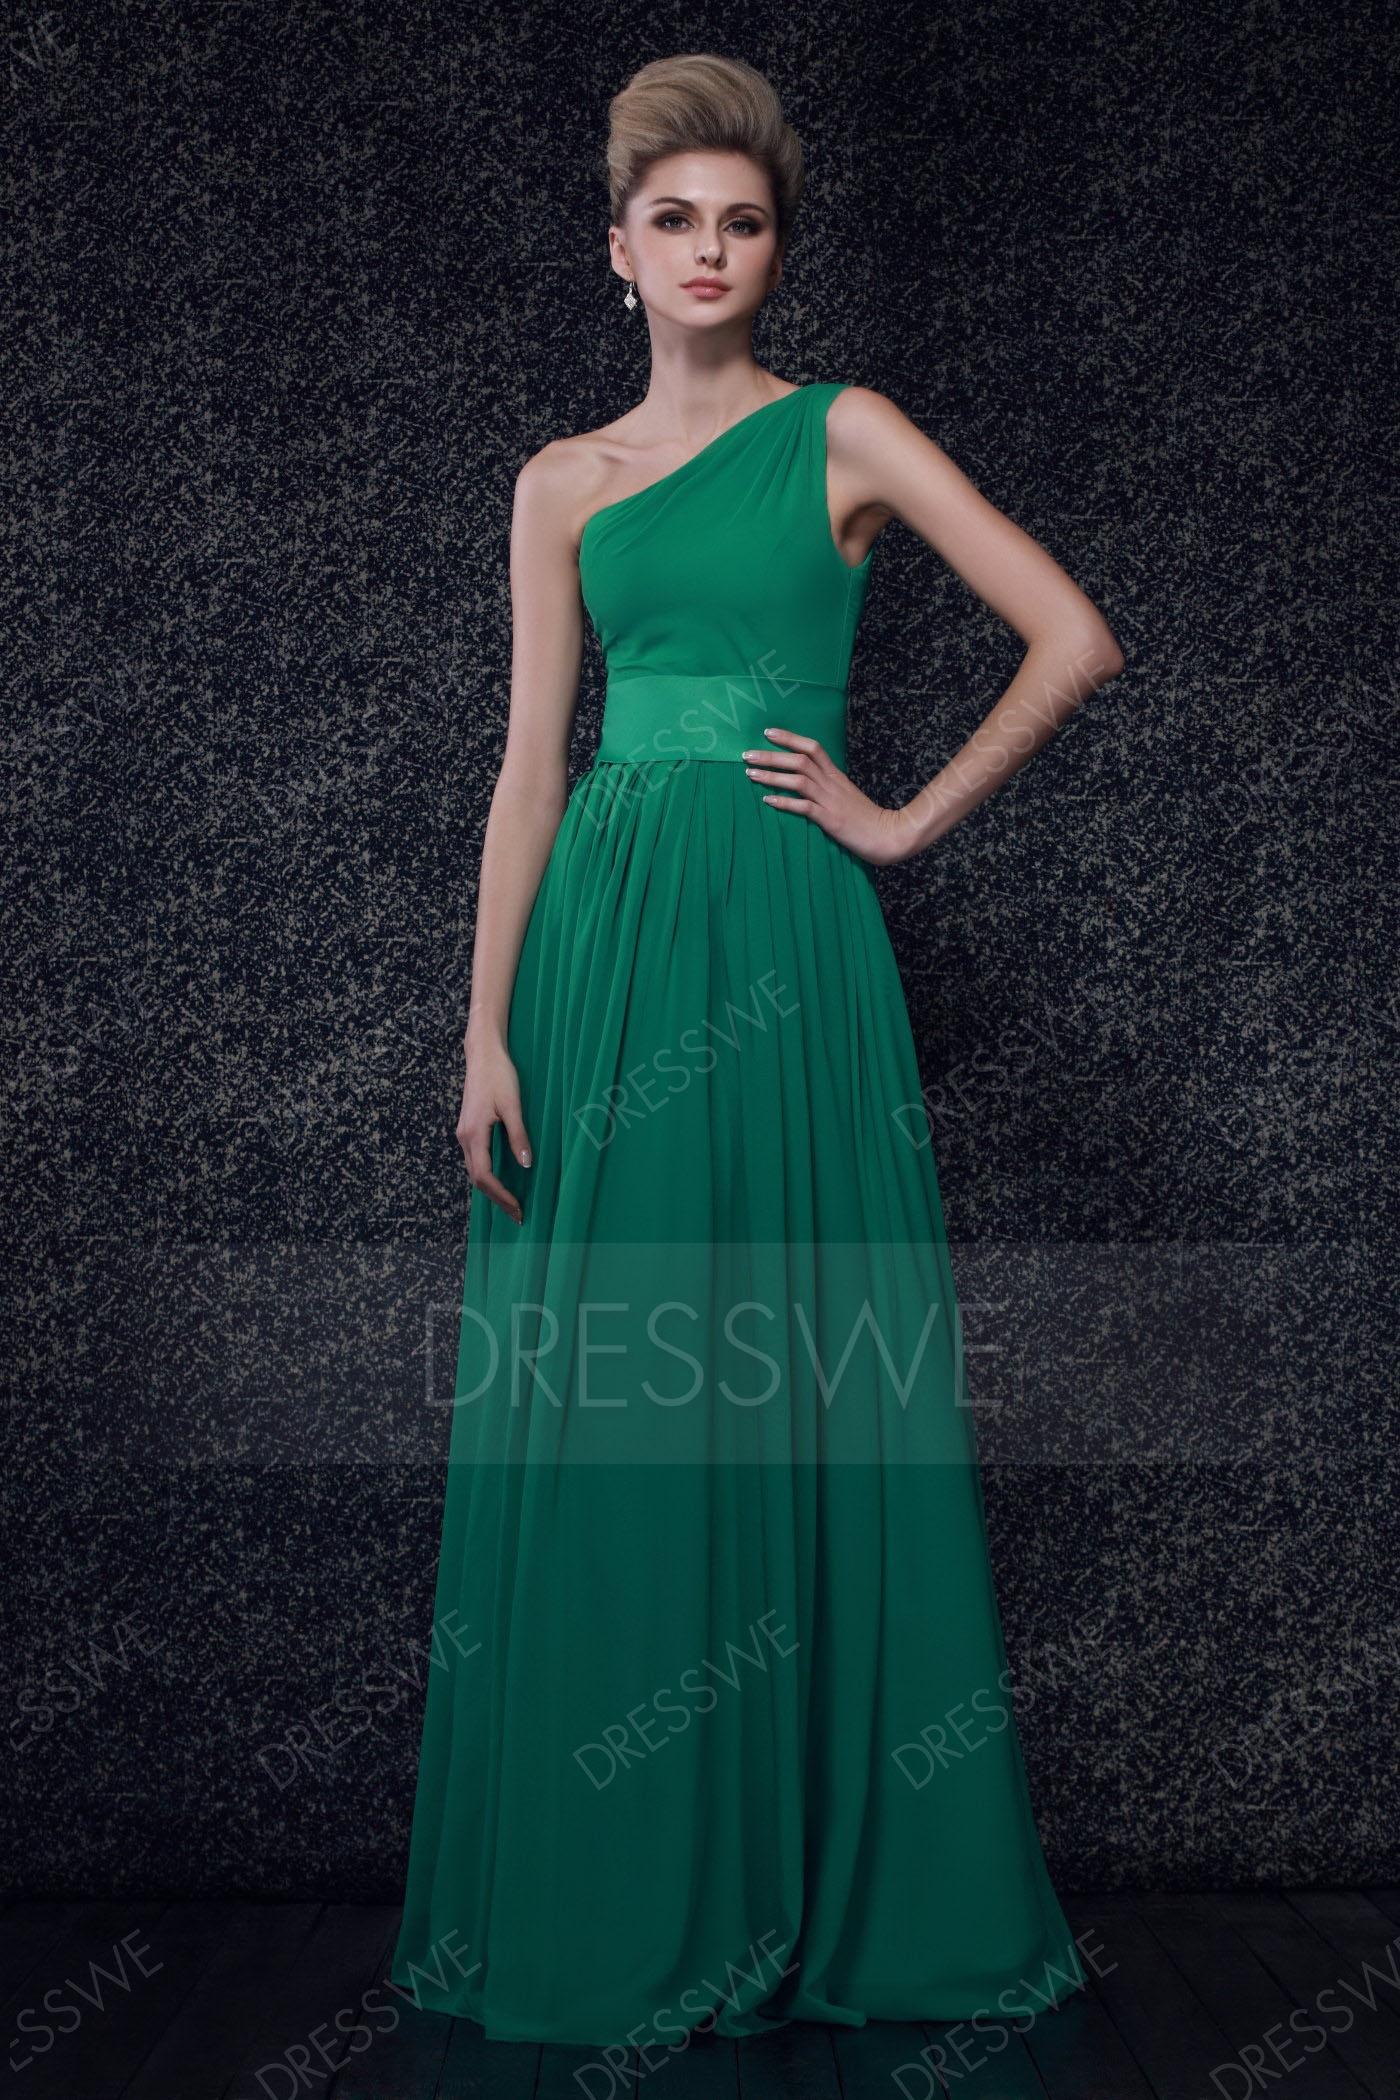 bridesmaid dresses in toronto discounted   images   dressesphotoscom 1400x2100